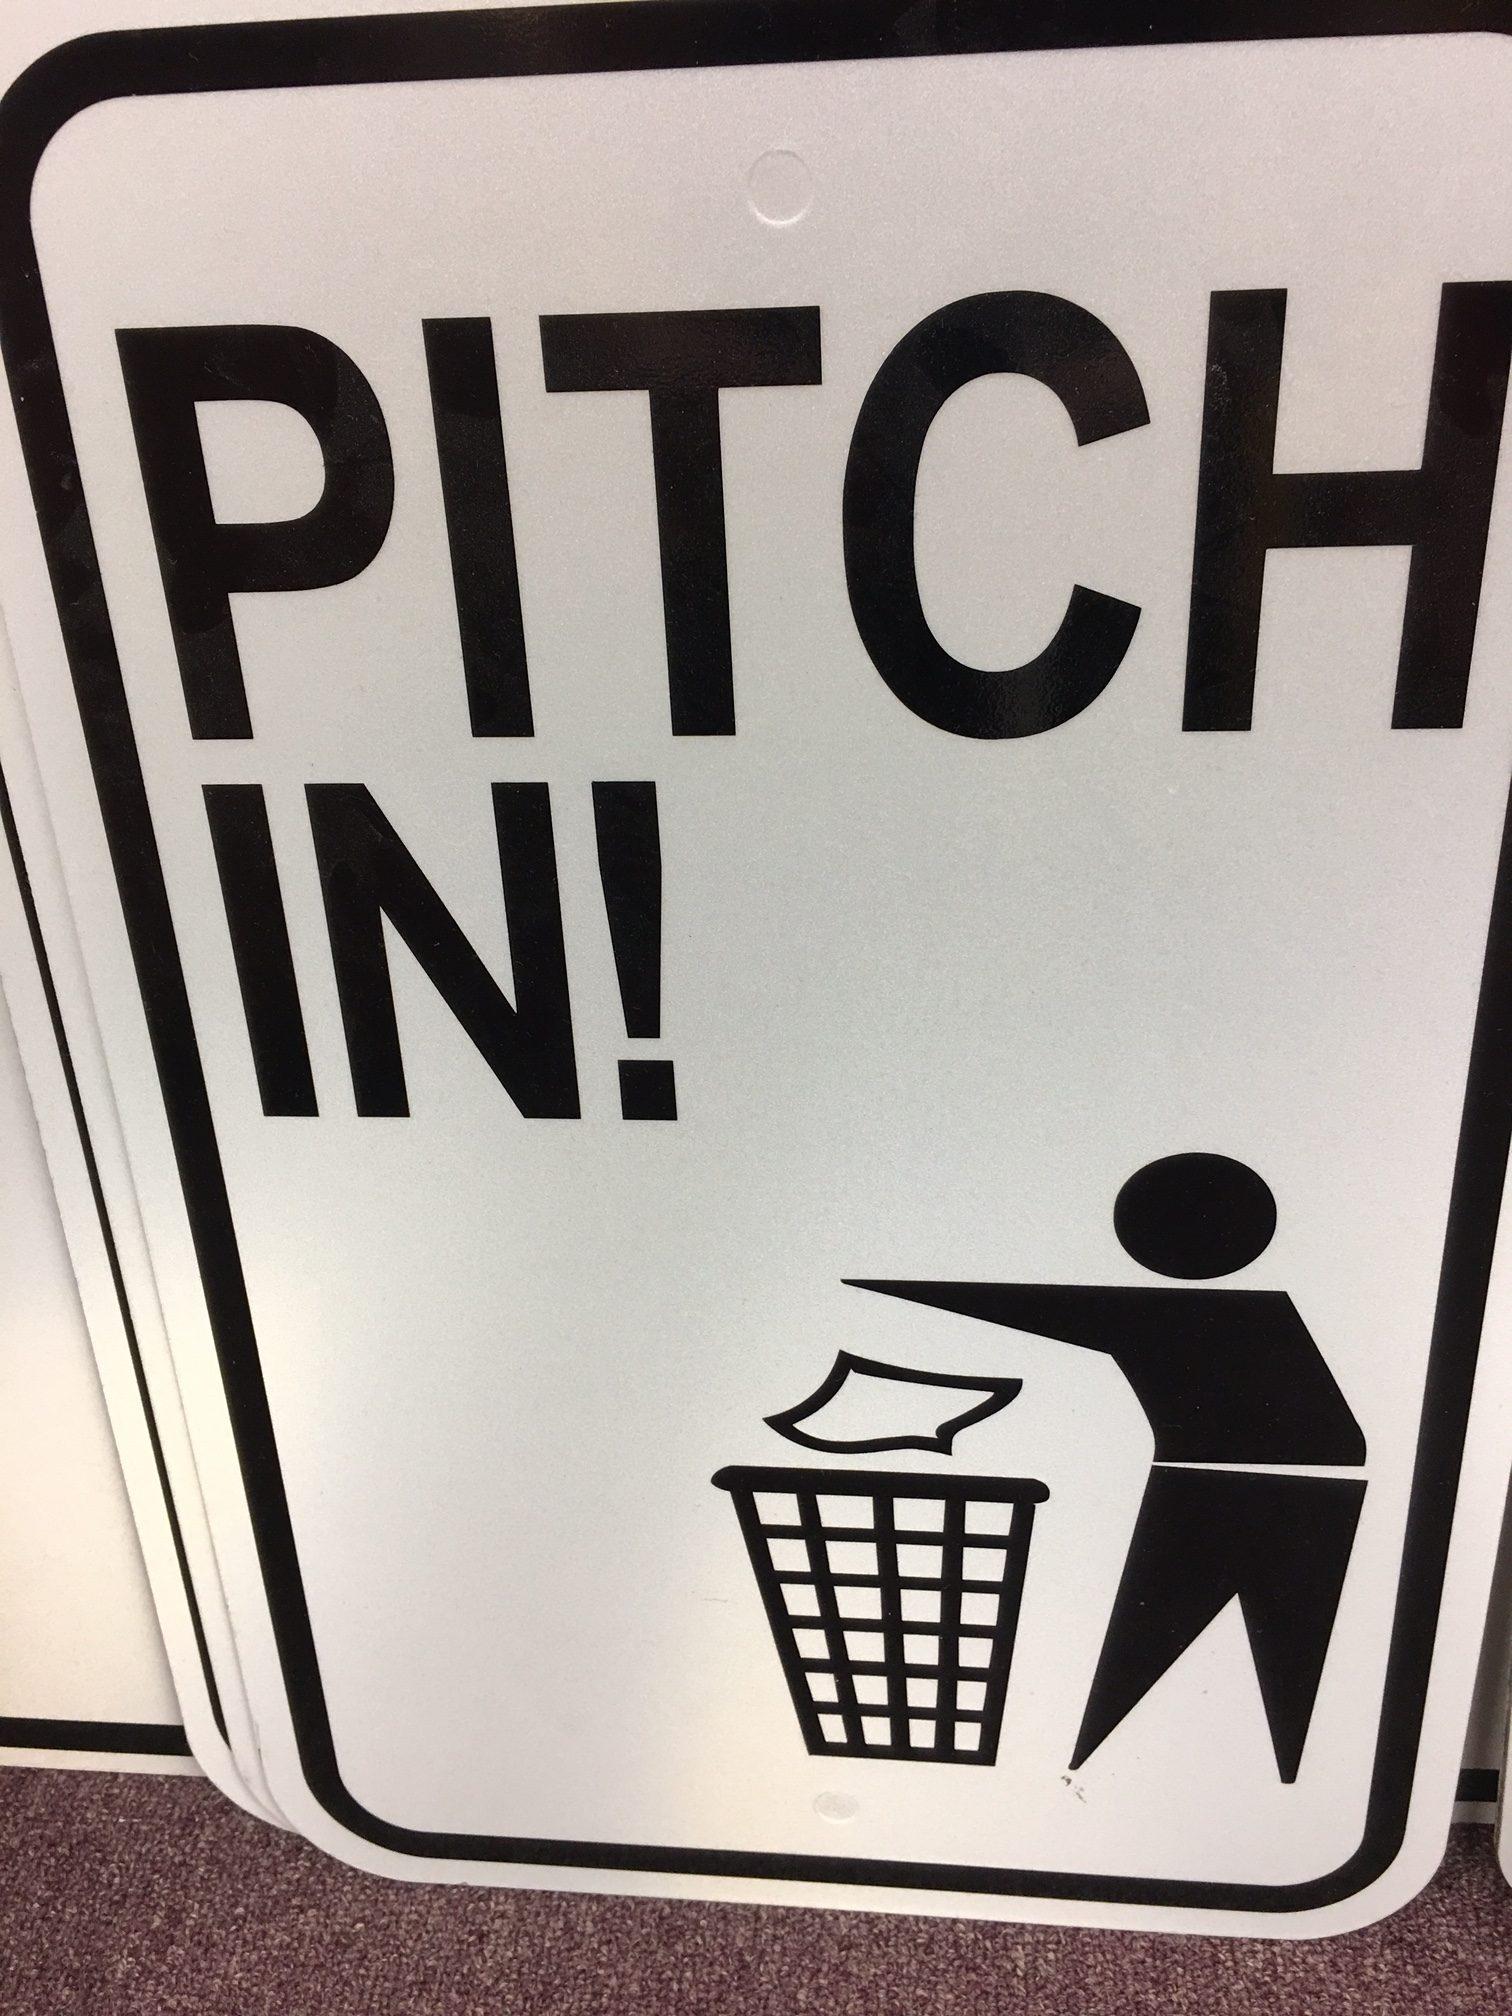 litter signage sponsorship program